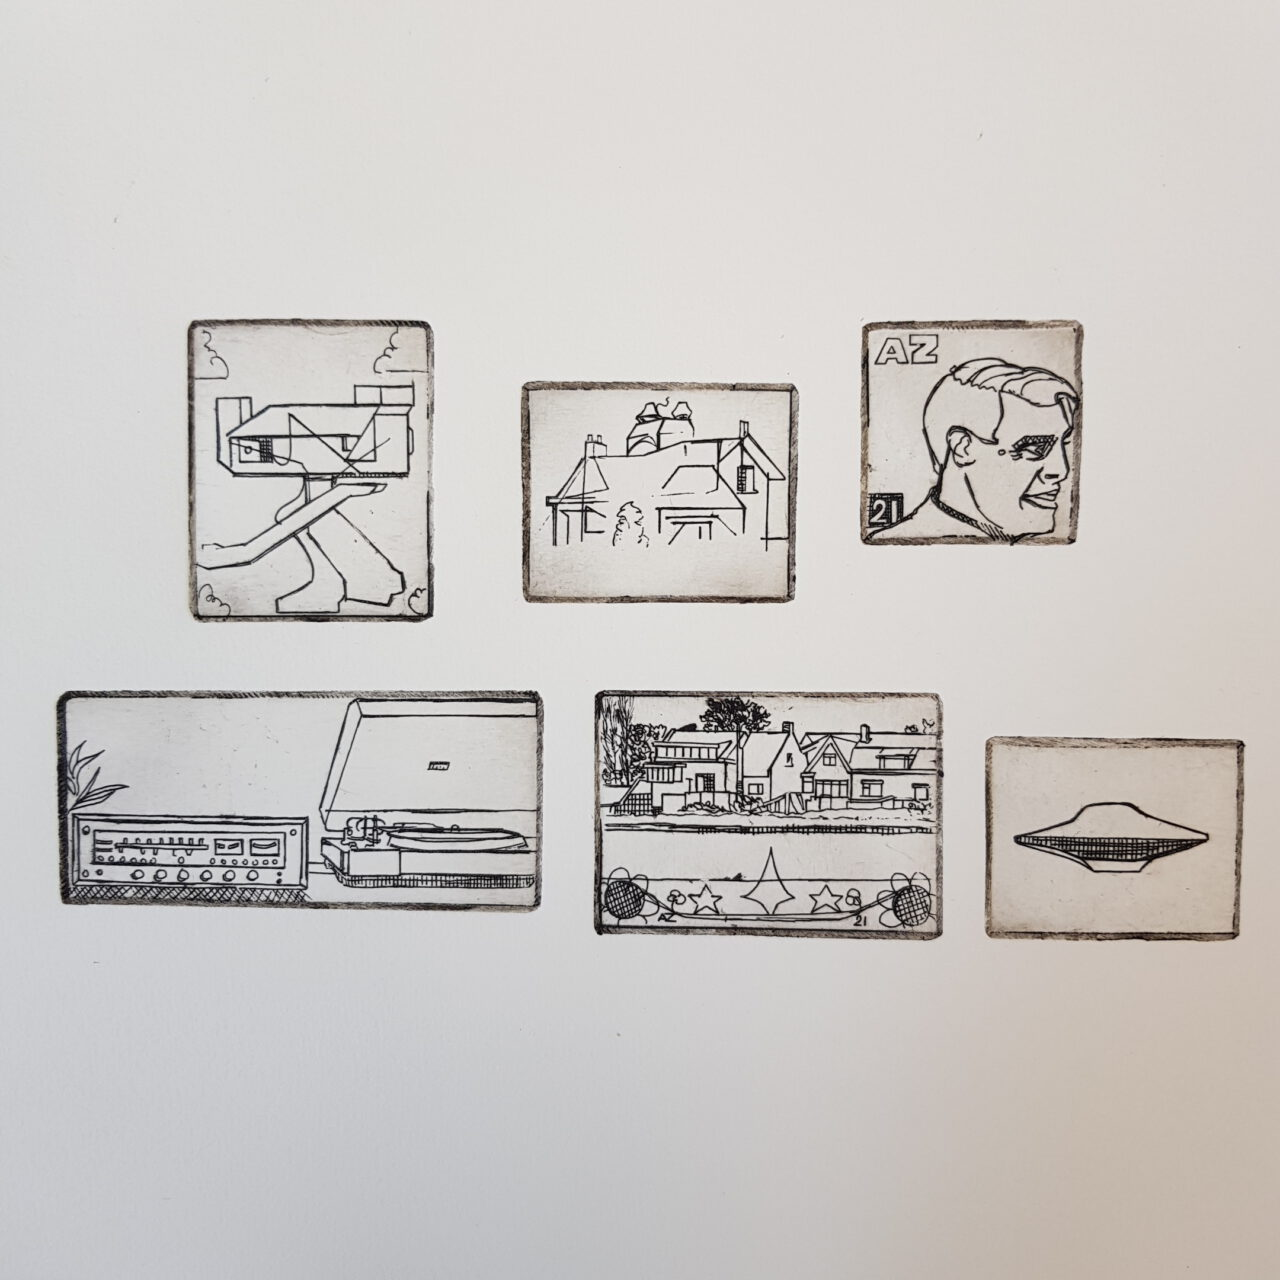 6 mini etchings on 1 sheet, 2021